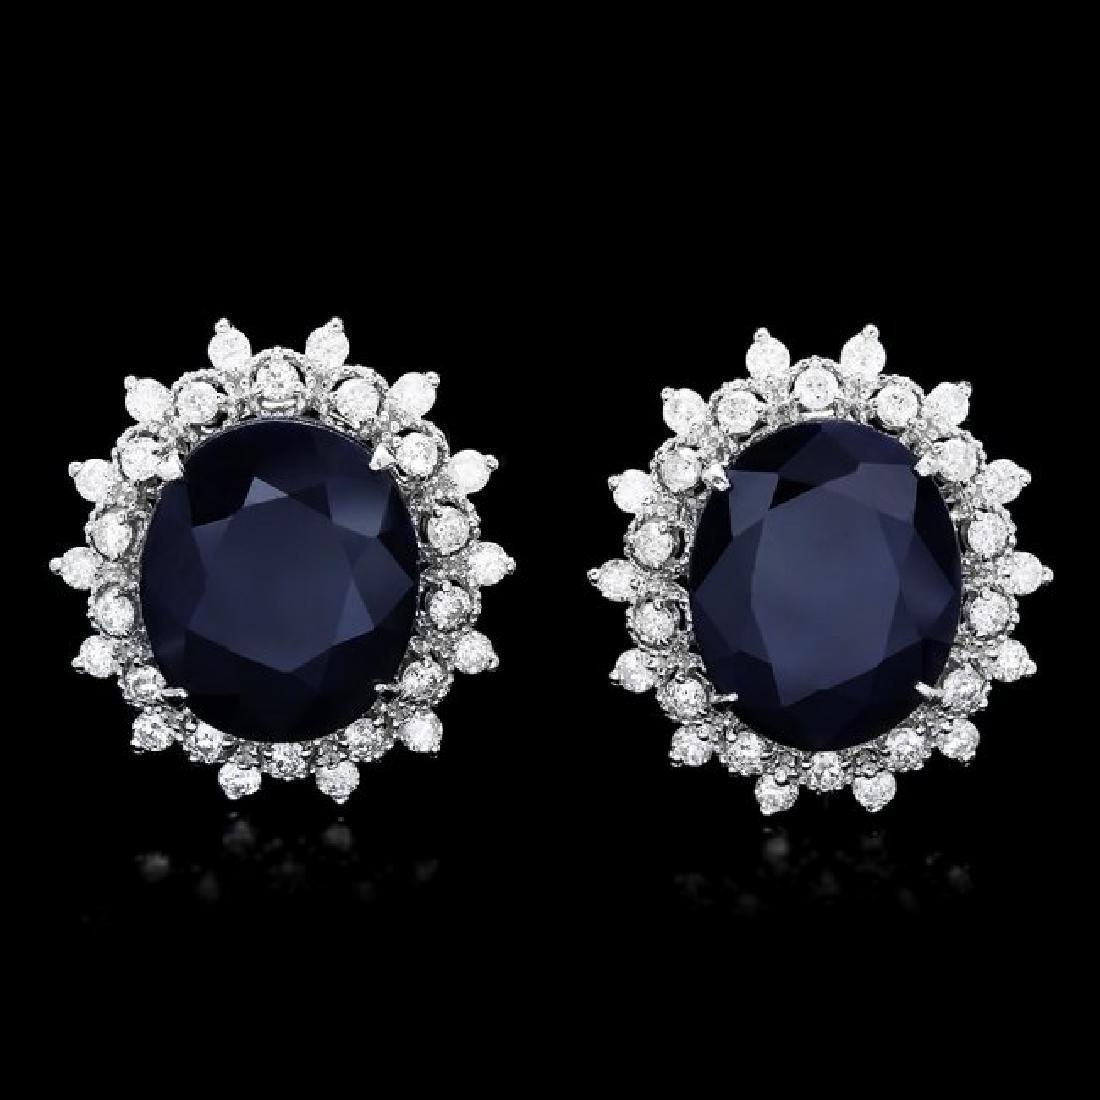 14k Gold 15ct Sapphire 1.40ct Diamond Earrings